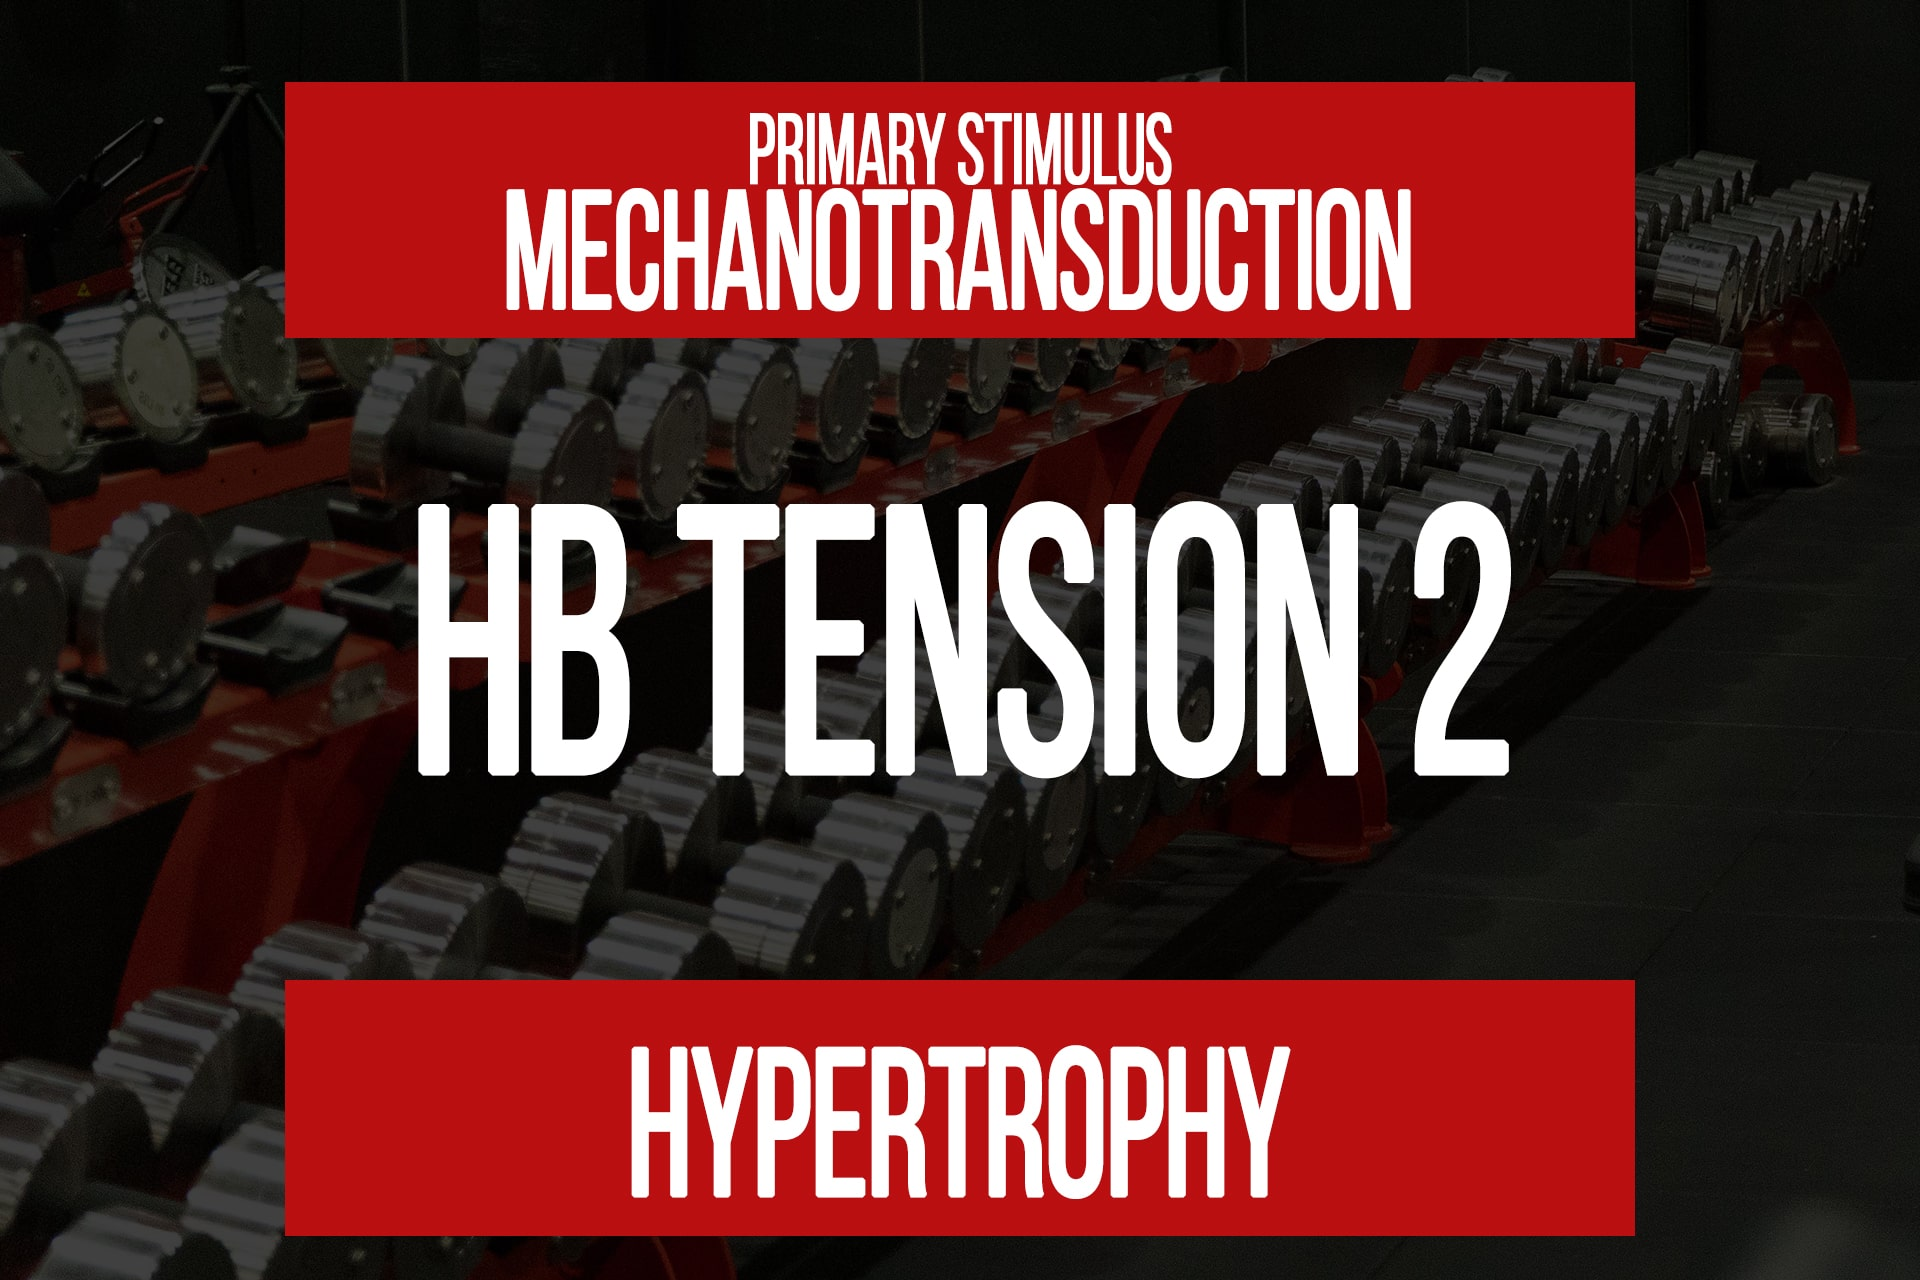 HB Tension 2